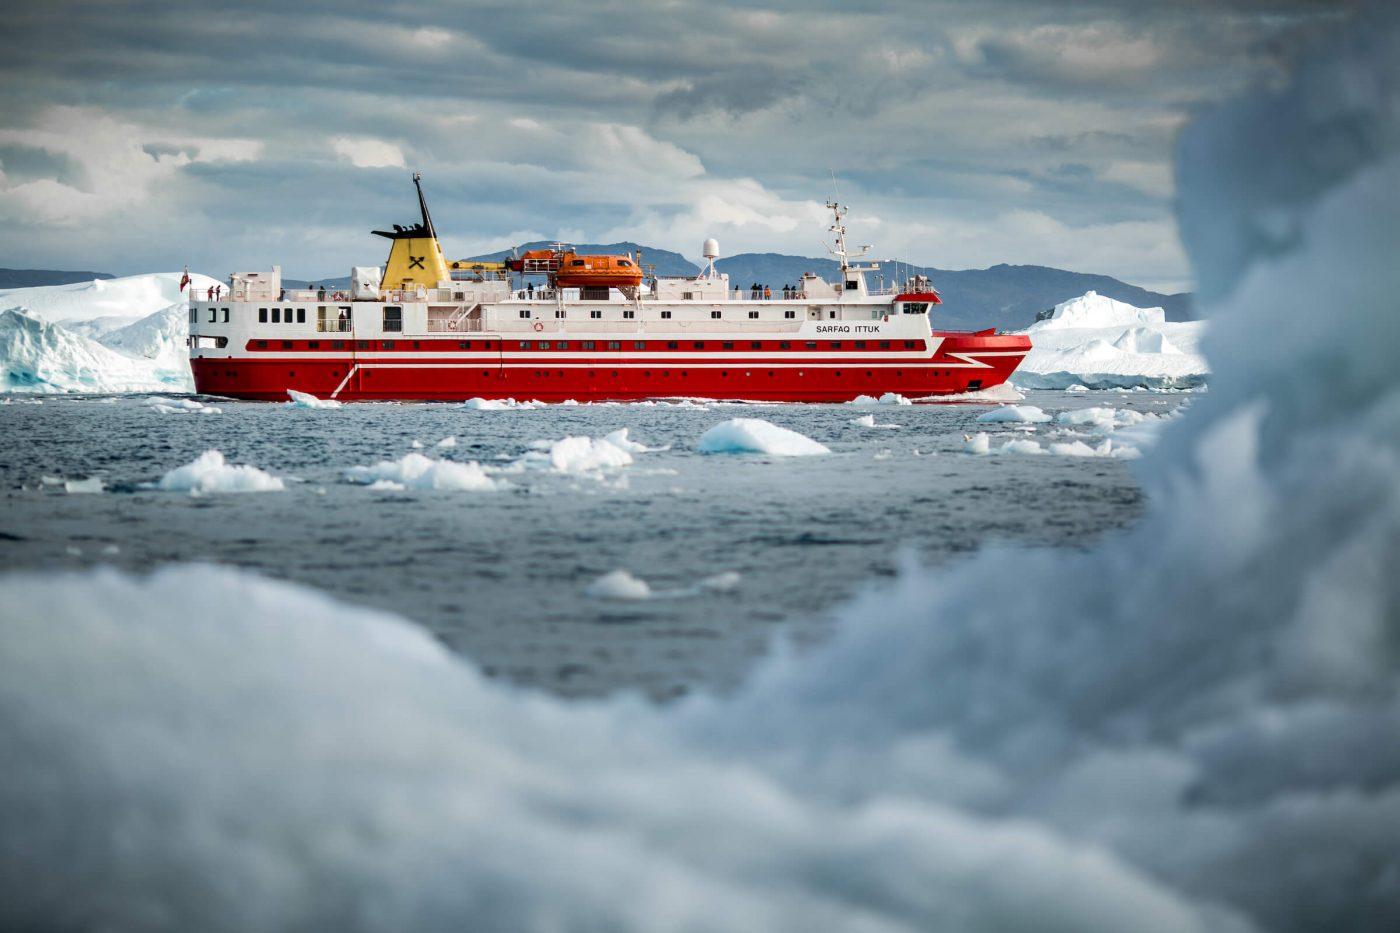 Sarfaq Ittuk cruising in the Disko Bay outside Ilulissat ice fjord in Greenland